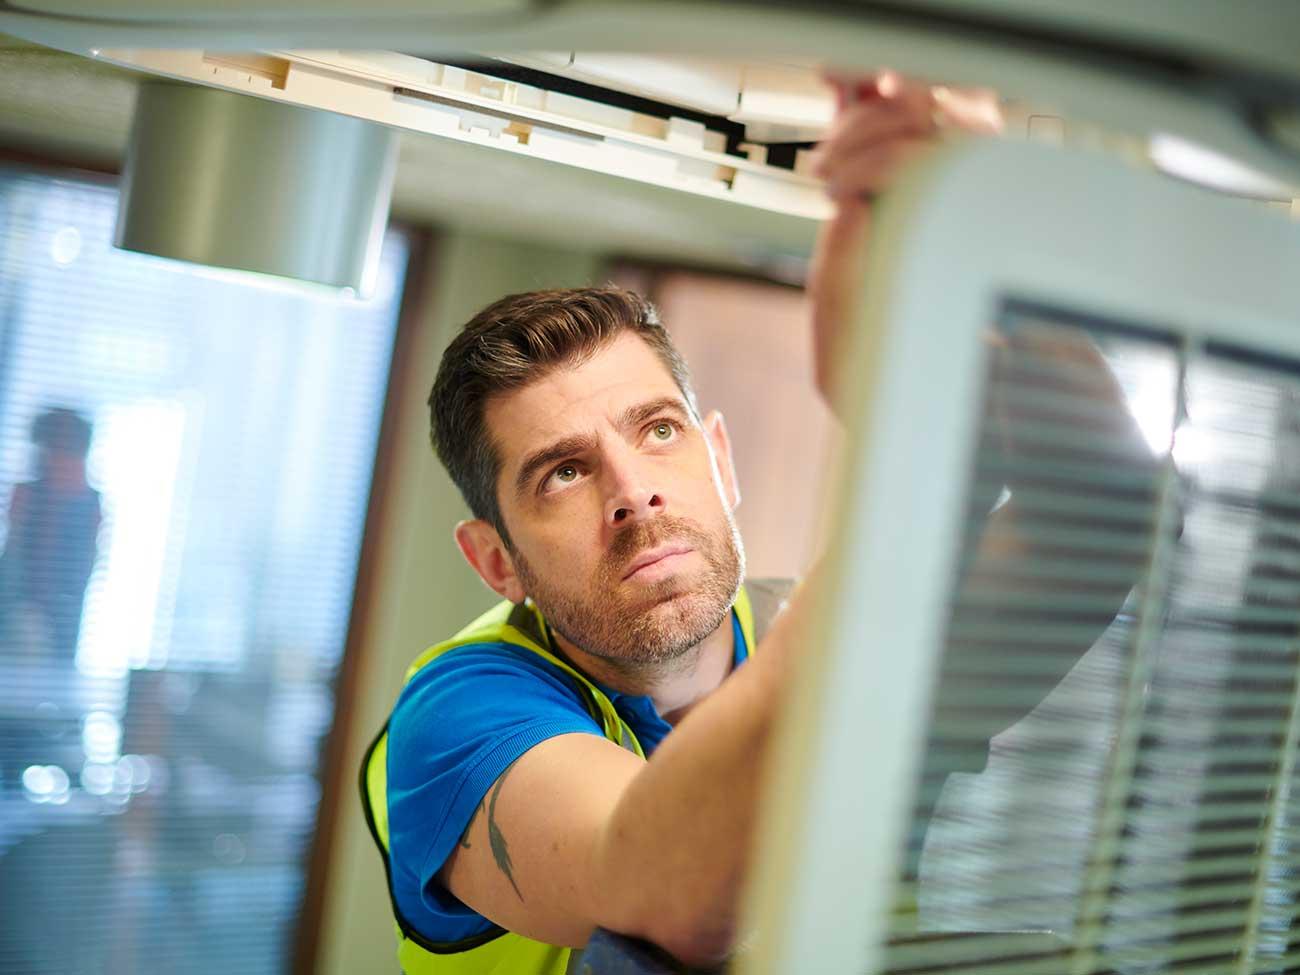 KLimatechniker arbeitet an Klimaanlage